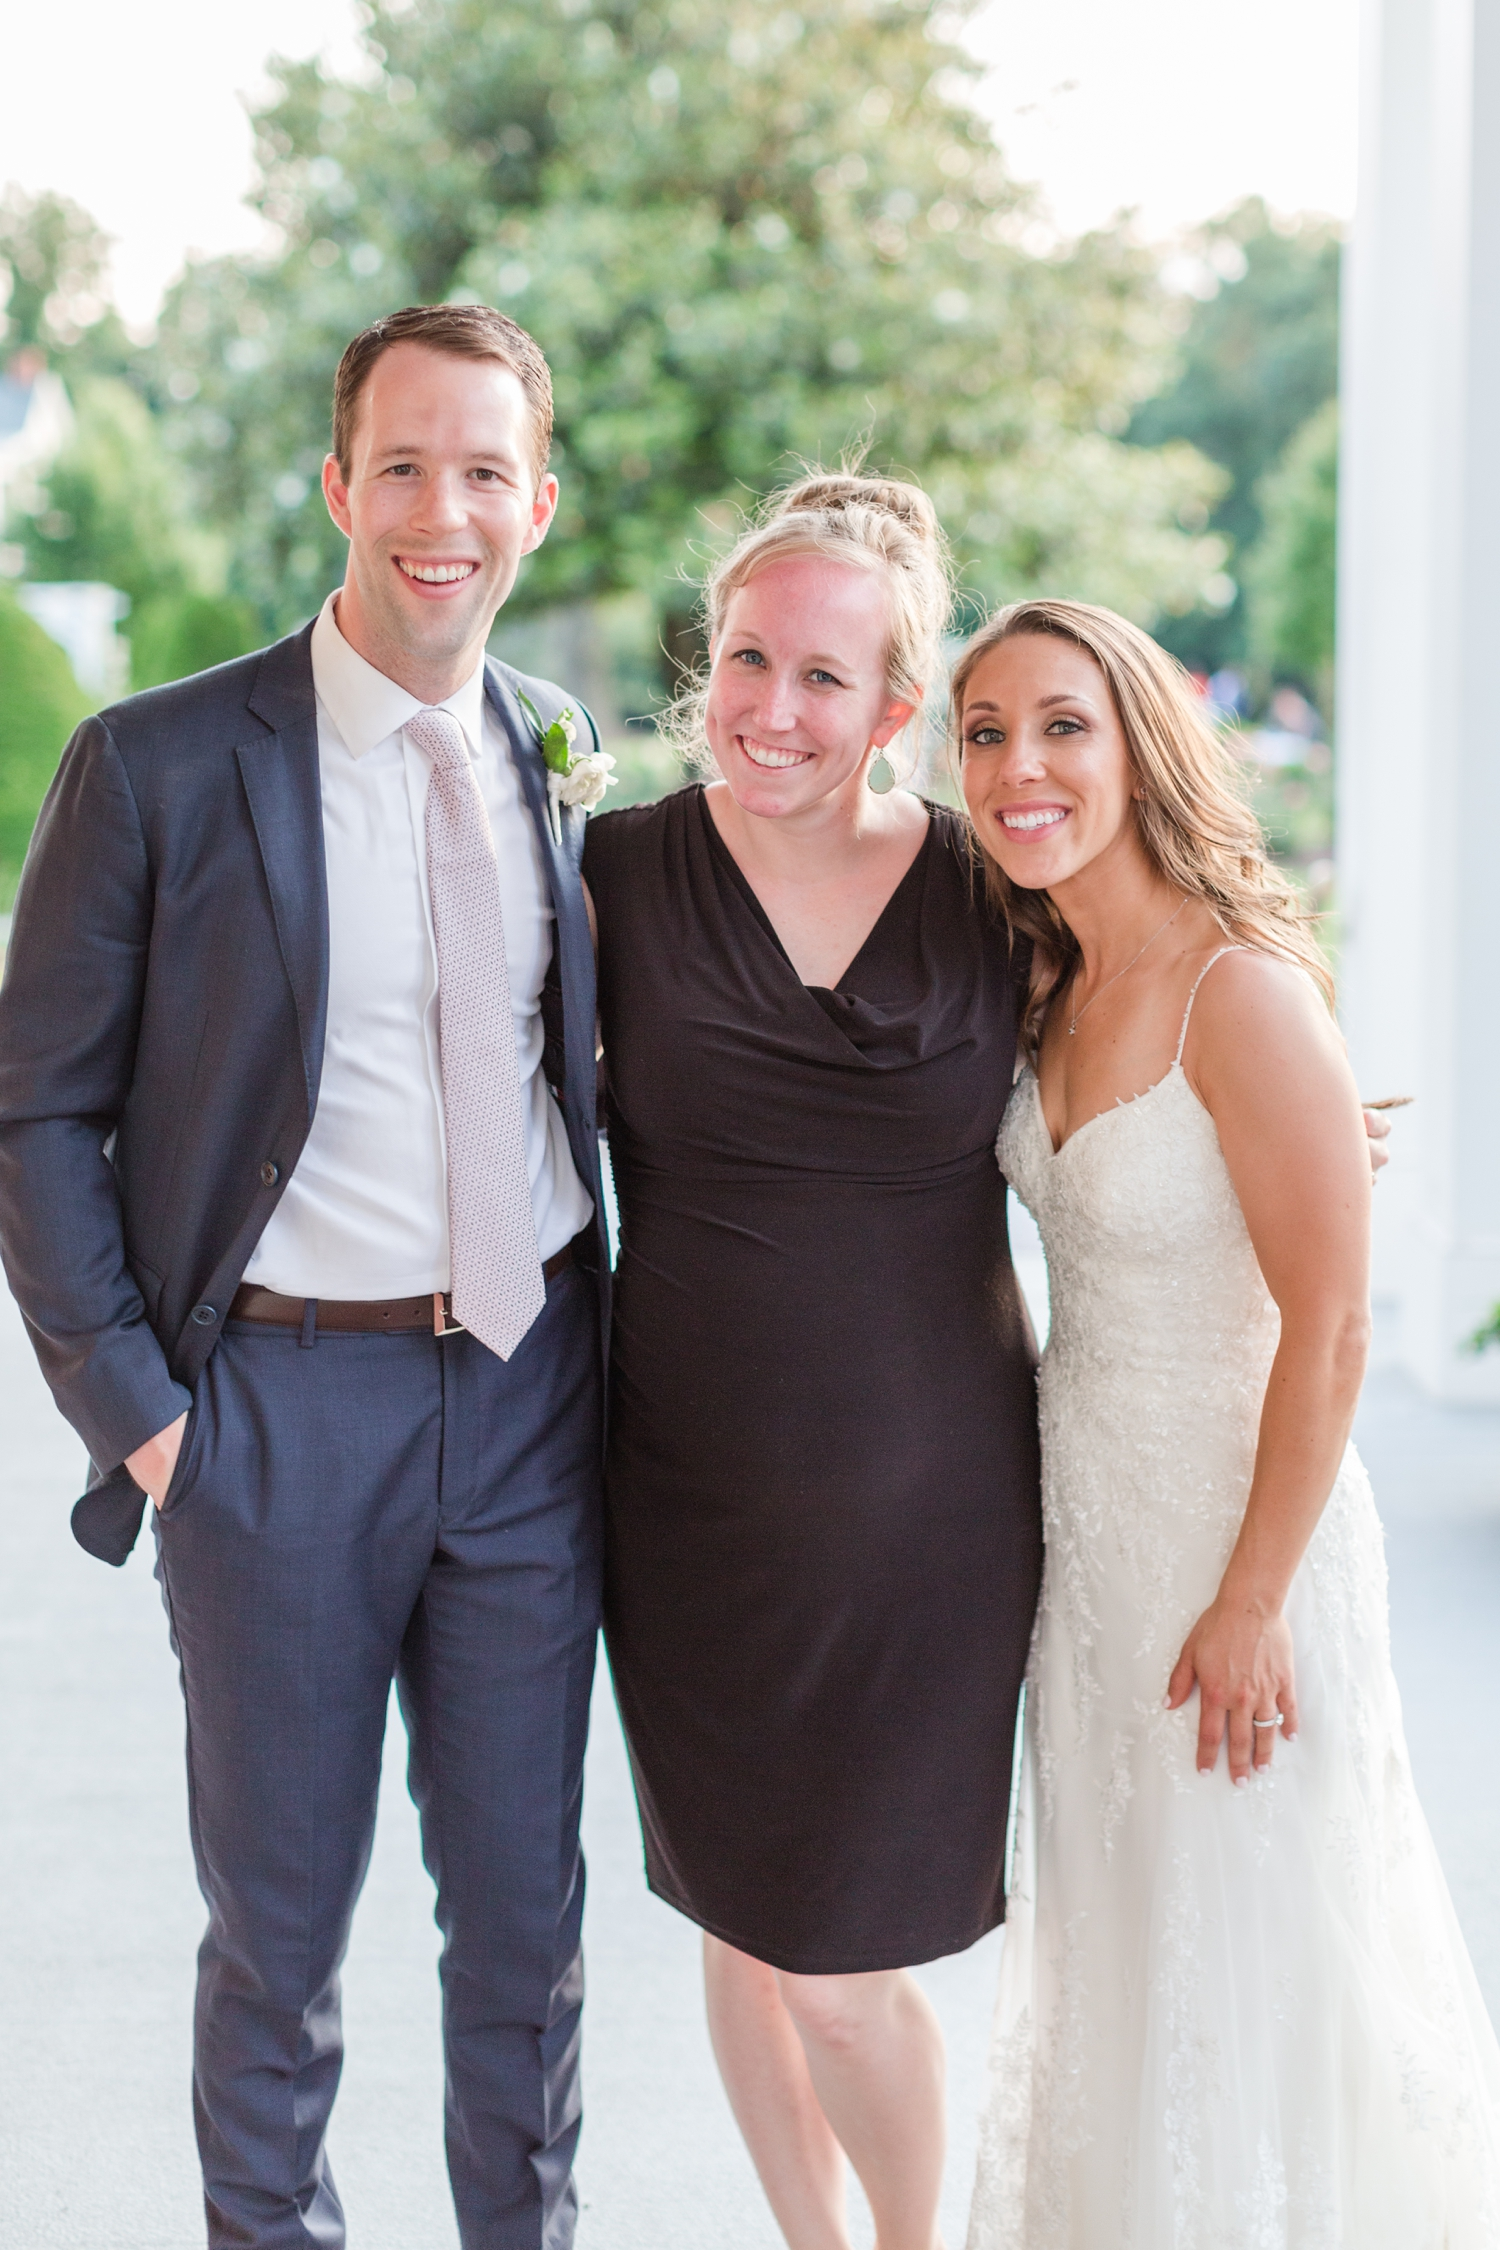 Malat Wedding 3-Bride & Groom Portraits-1082_Maryland-Virginia-Wedding-Photographer-Behind-The-Scenes-anna-grace-photography-photo.jpg